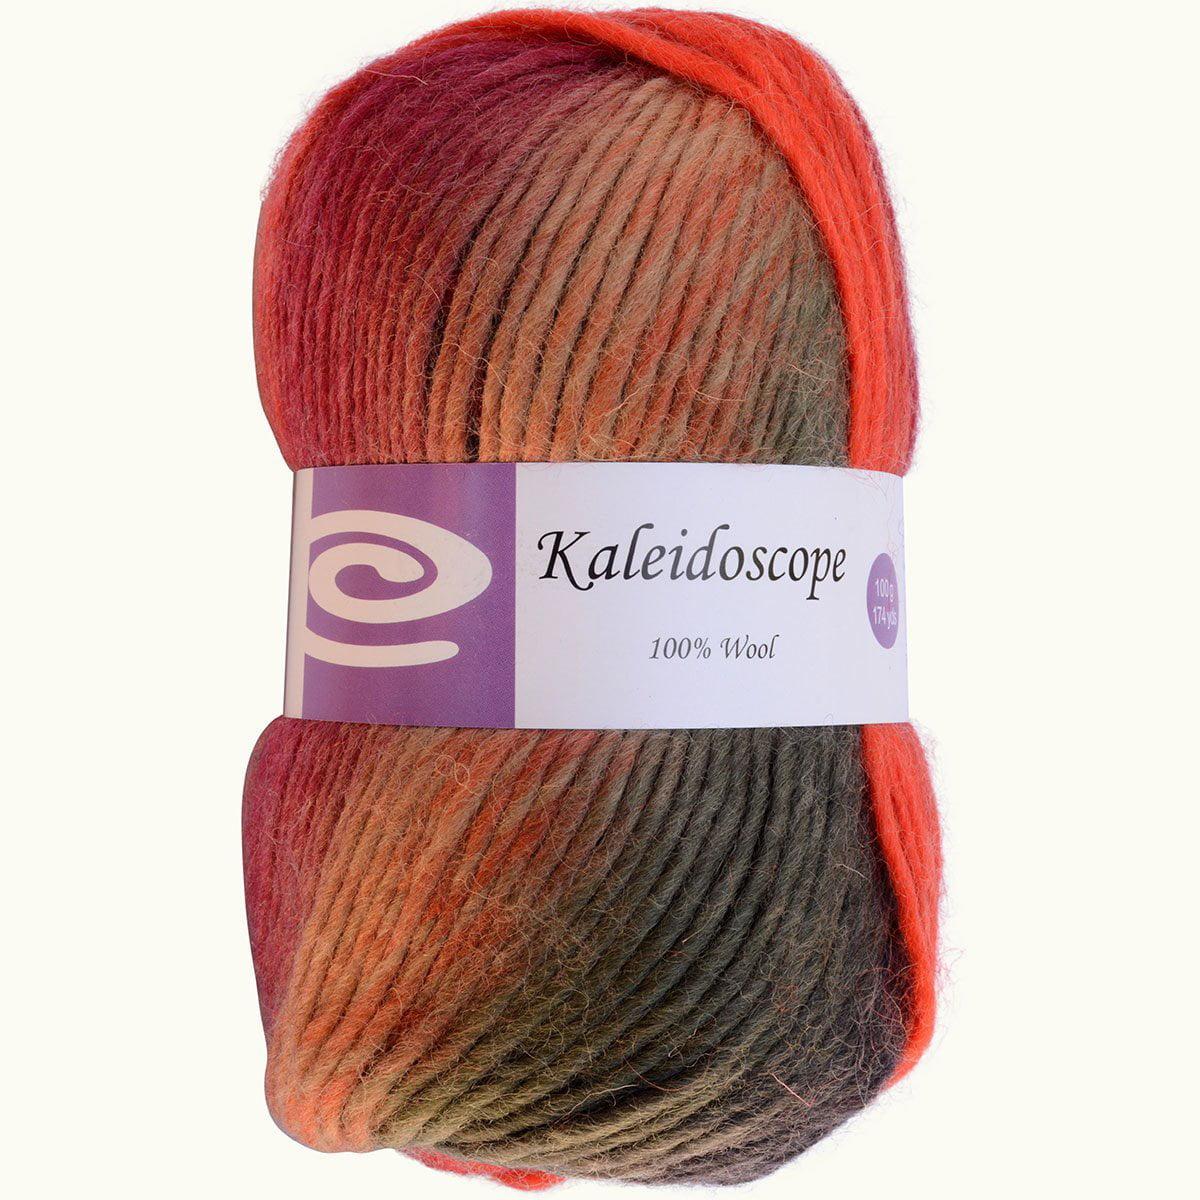 Kaleidoscope Yarn Autumn Leaves This Beautiful 100 Wool Yarn Is